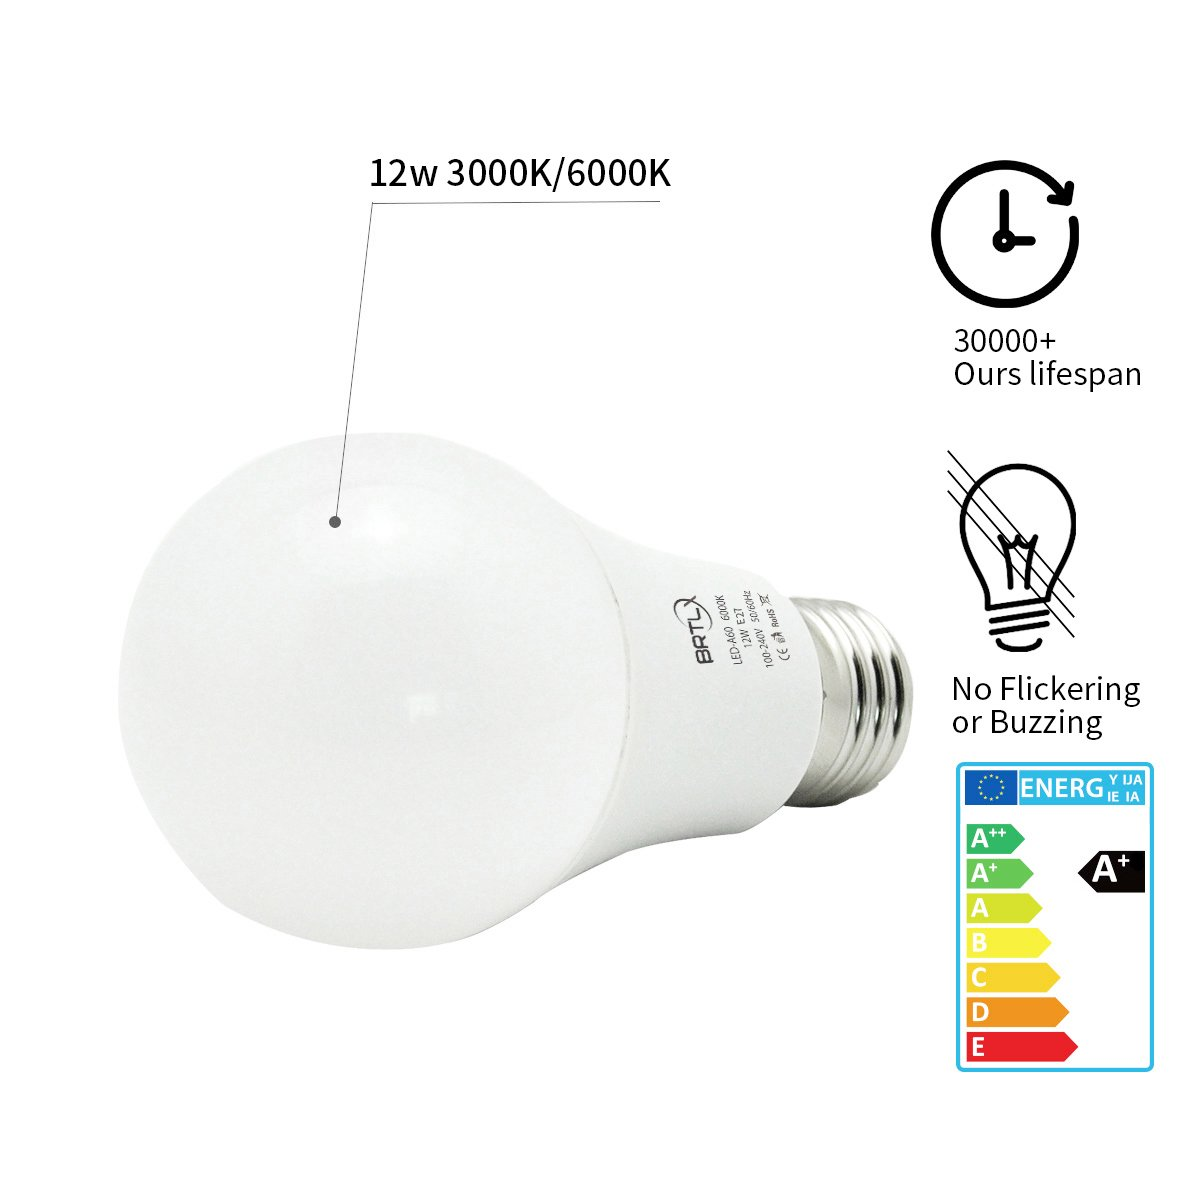 Bombilla LED Esférica Casquillo E27, 12W, Equivalente a 100W, Luz Blanca 6000K, 960 Lúmenes, no Regulable, Pack de 4 Unidades: Amazon.es: Iluminación